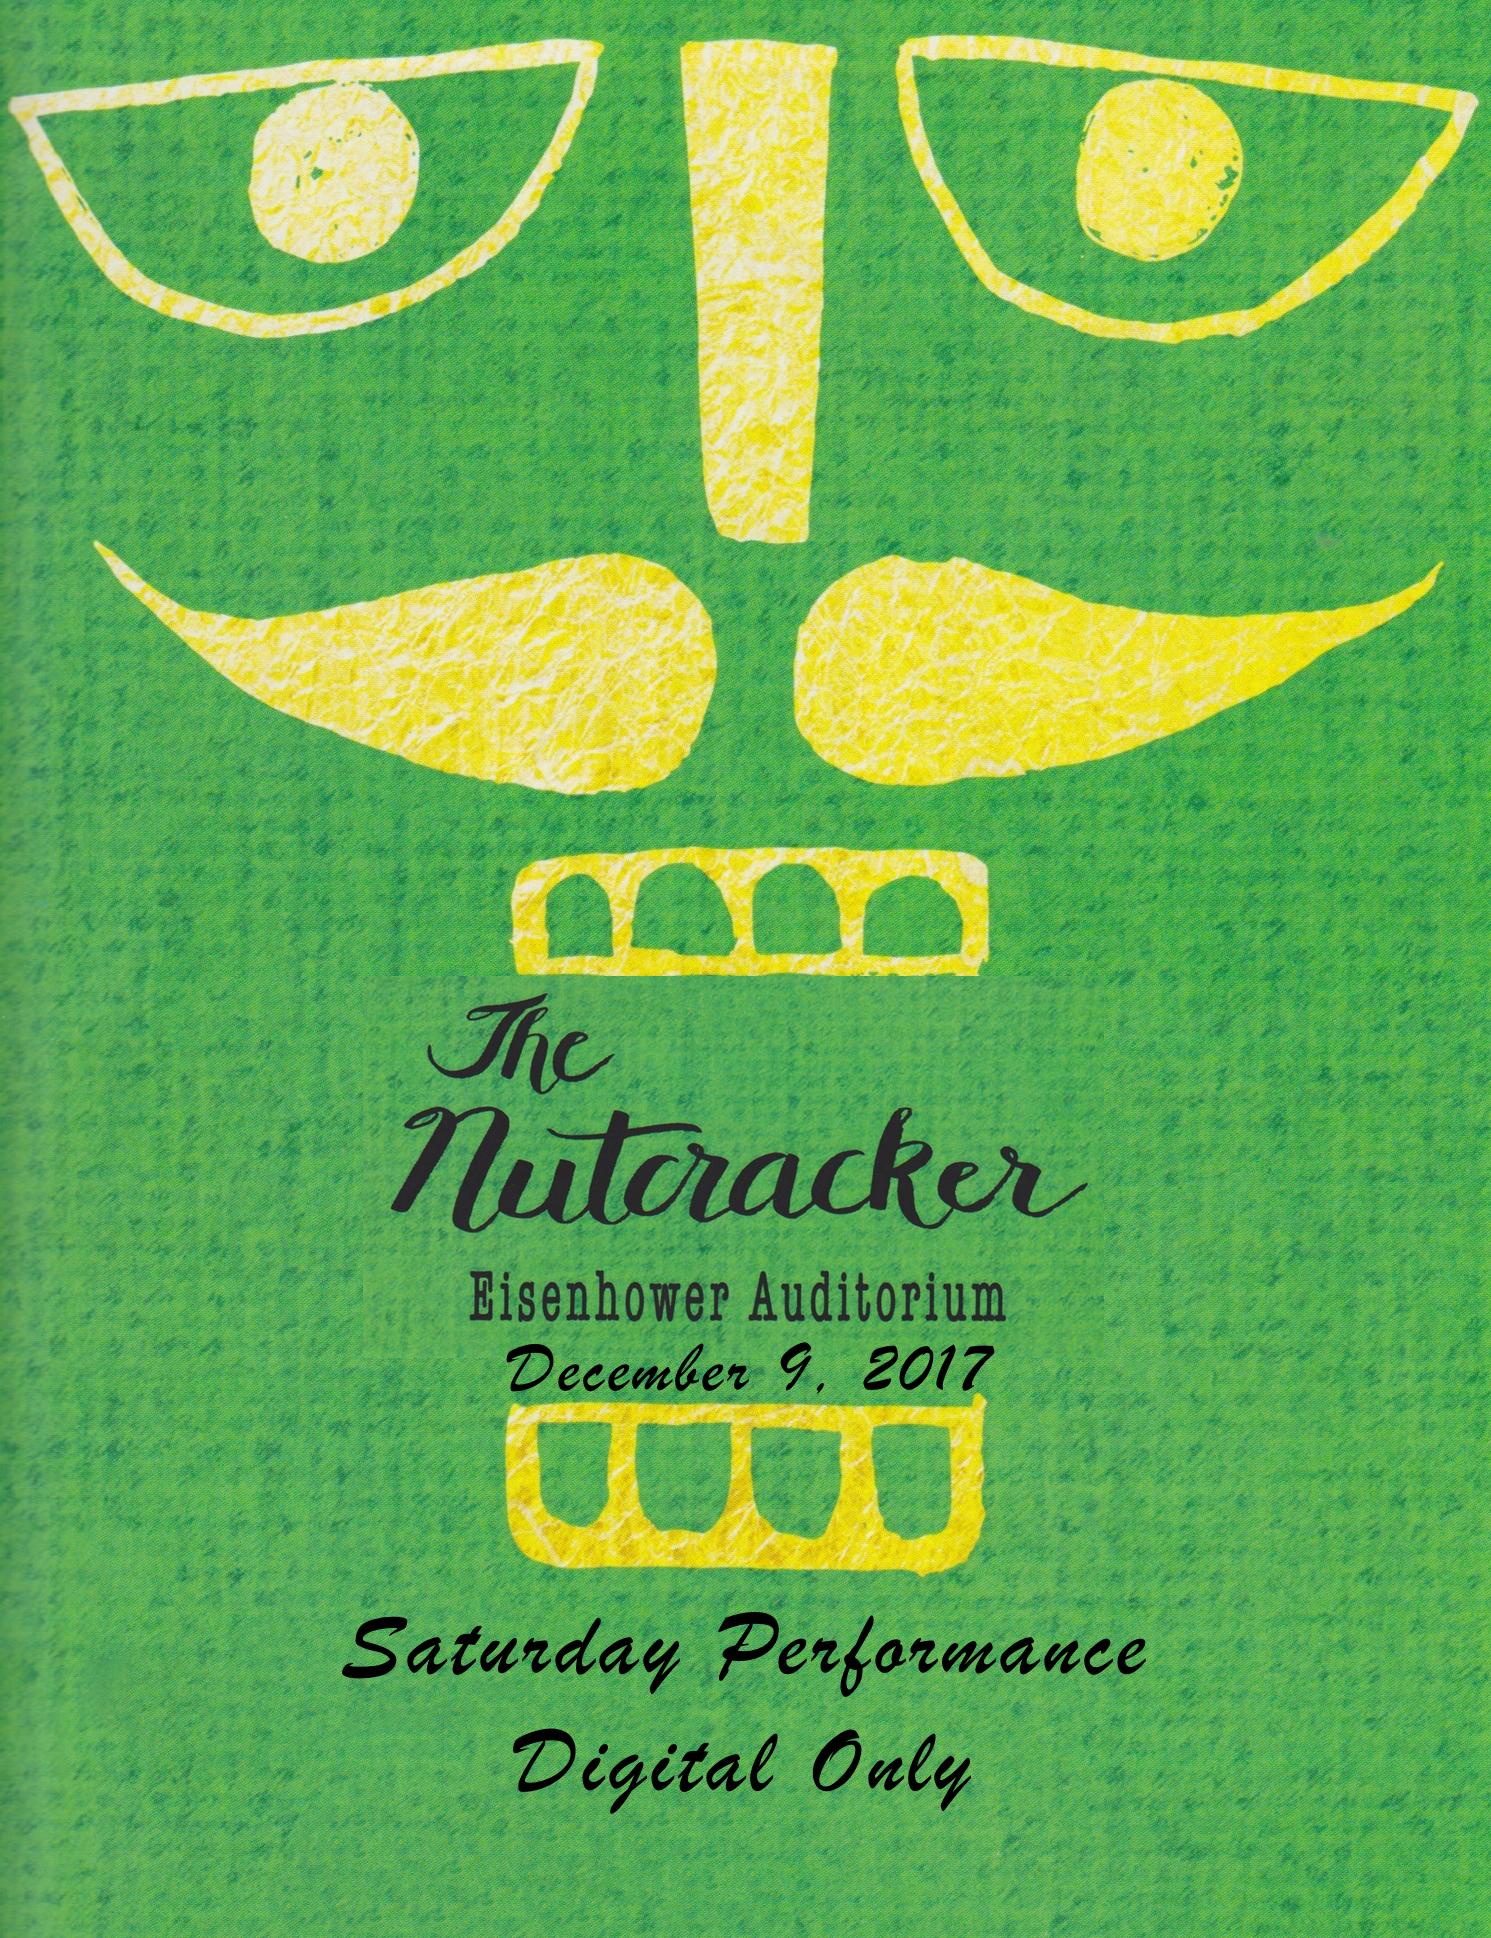 Saturday Performance, Digital Copy Only